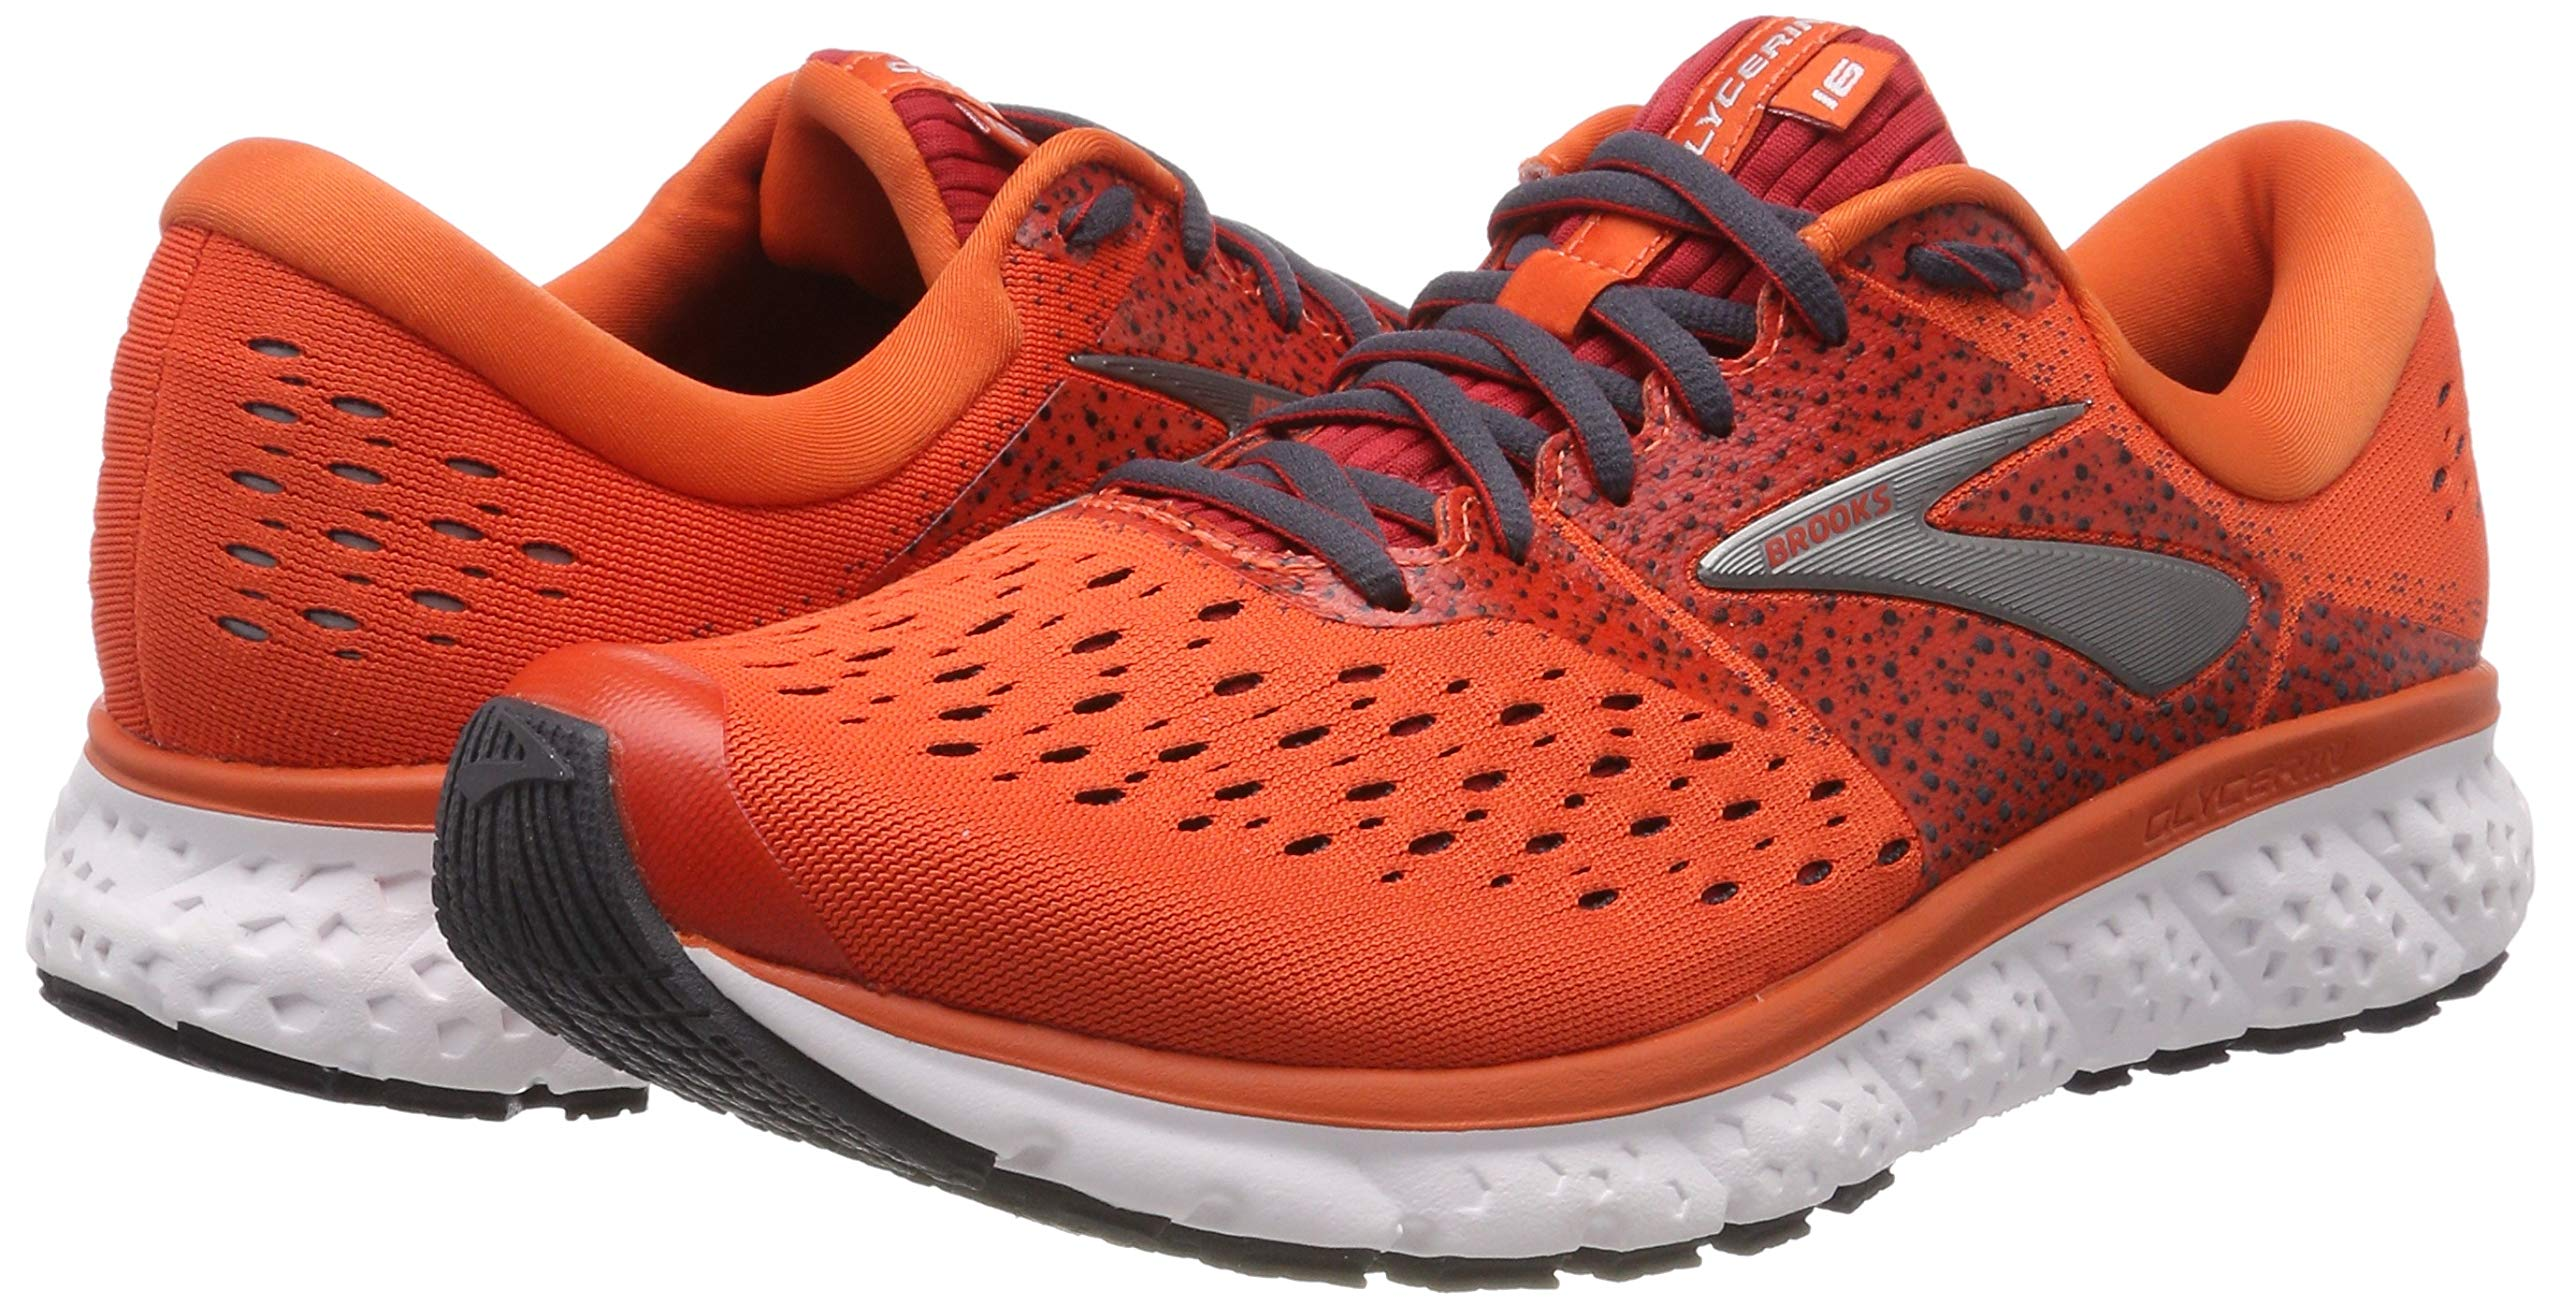 81iQoPk8R6L - Brooks Men's Glycerin 16 Running Shoes